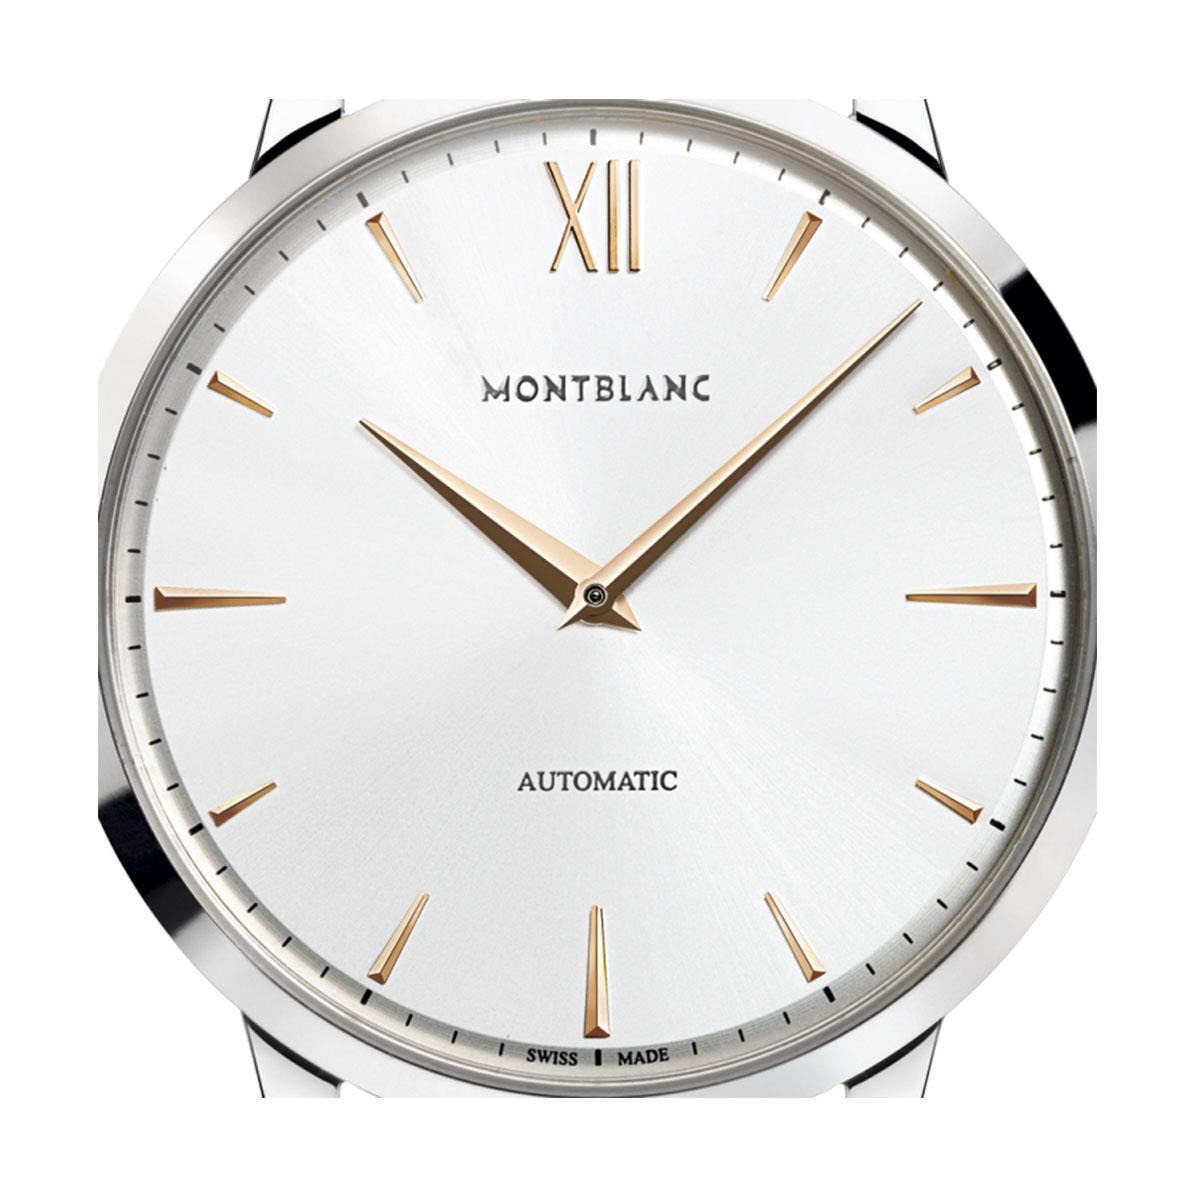 6b56c39a054 Relógio Montblanc Heritage Spirit Automatic